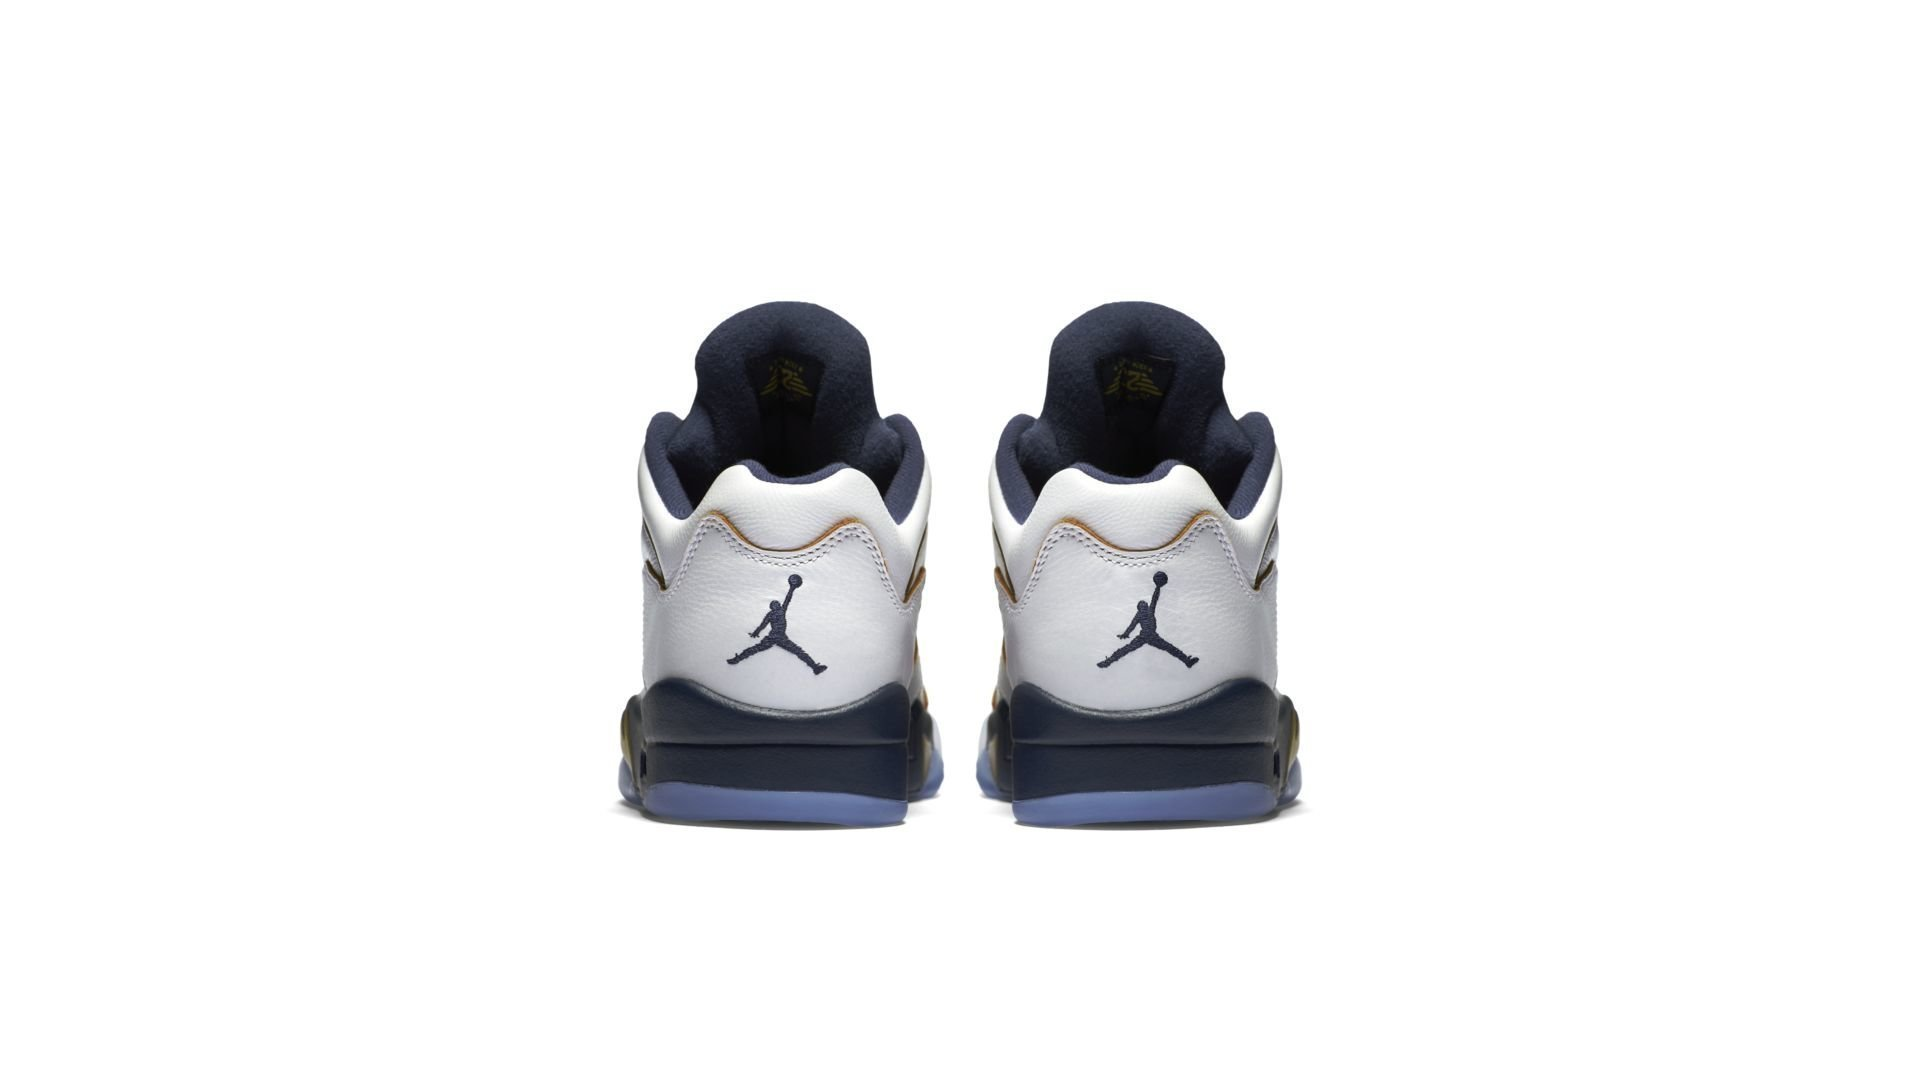 Jordan 5 Retro Low Dunk From Above (819171-135)